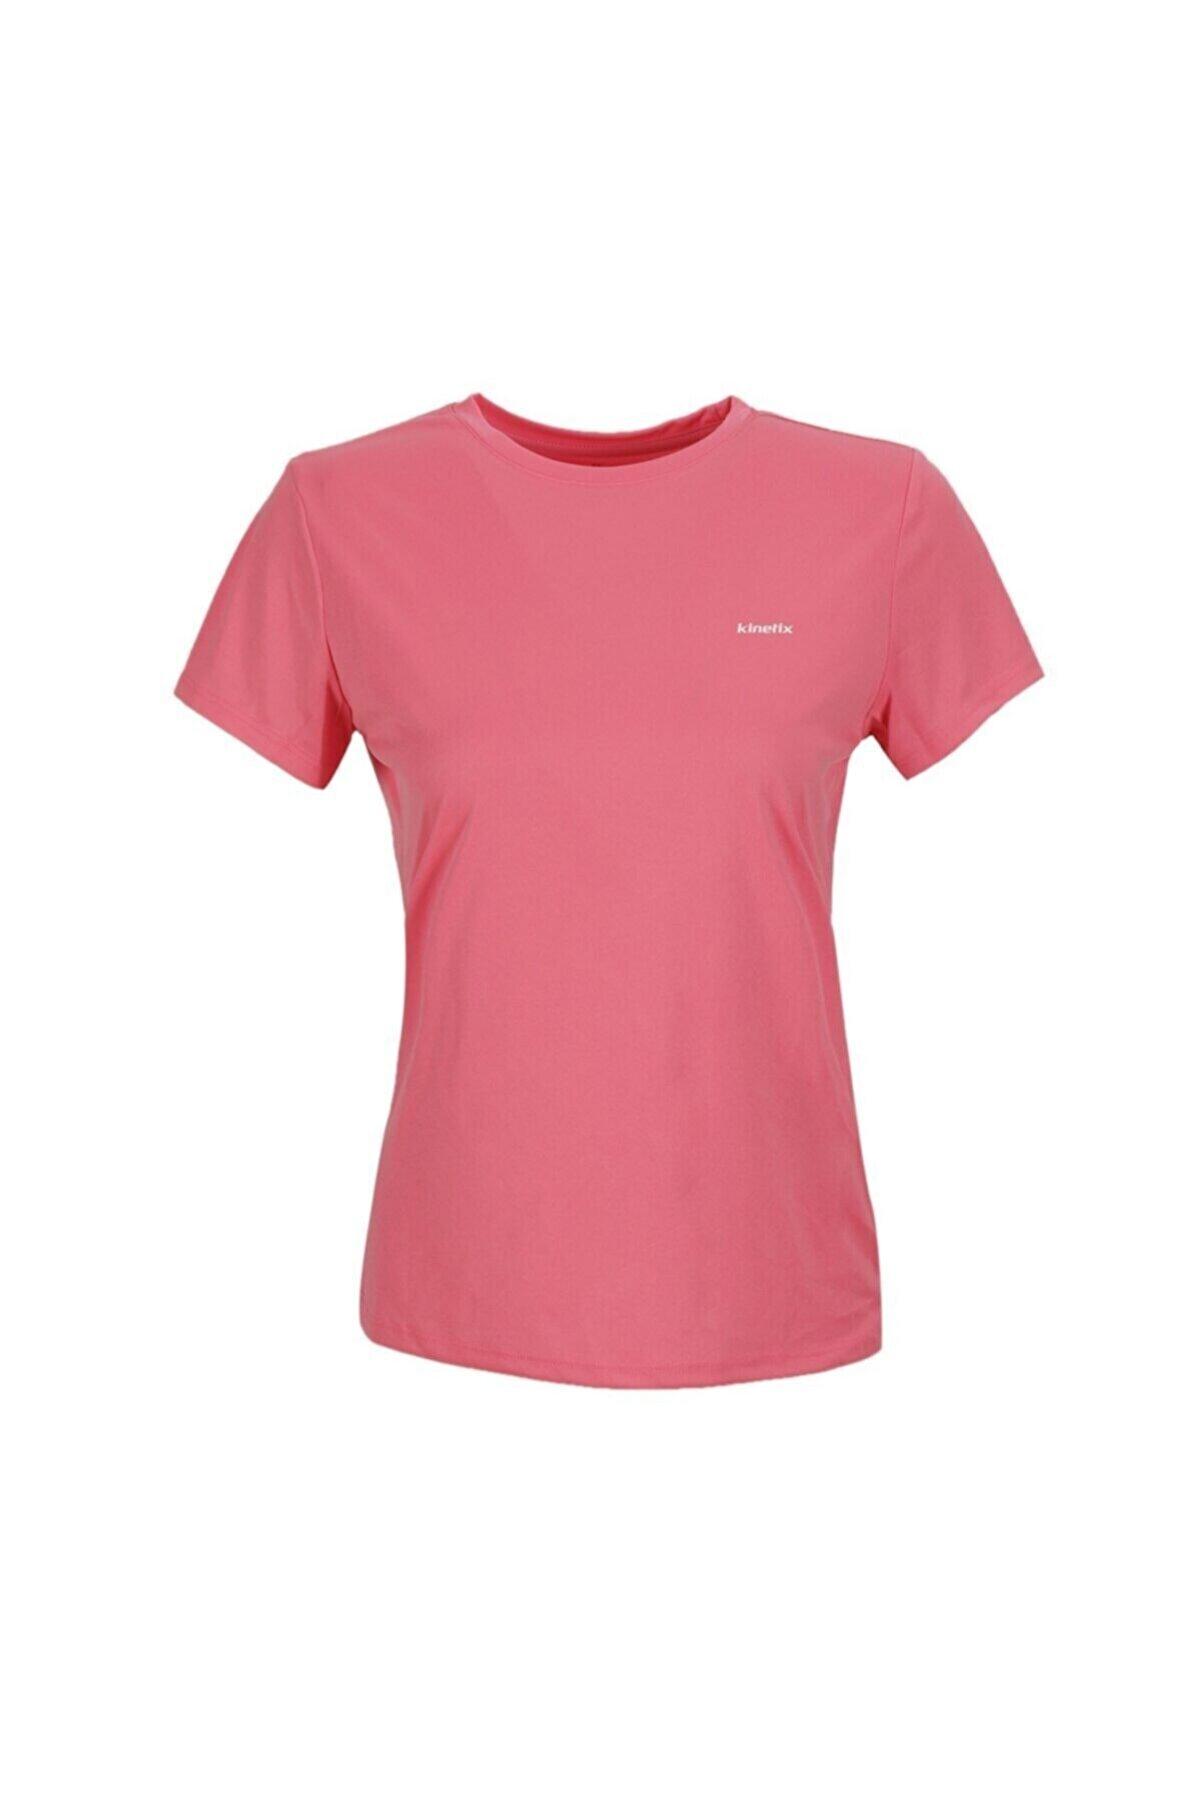 Kinetix SN230 BASIC PES C NECK T- Fuşya Kadın T-Shirt 100581632